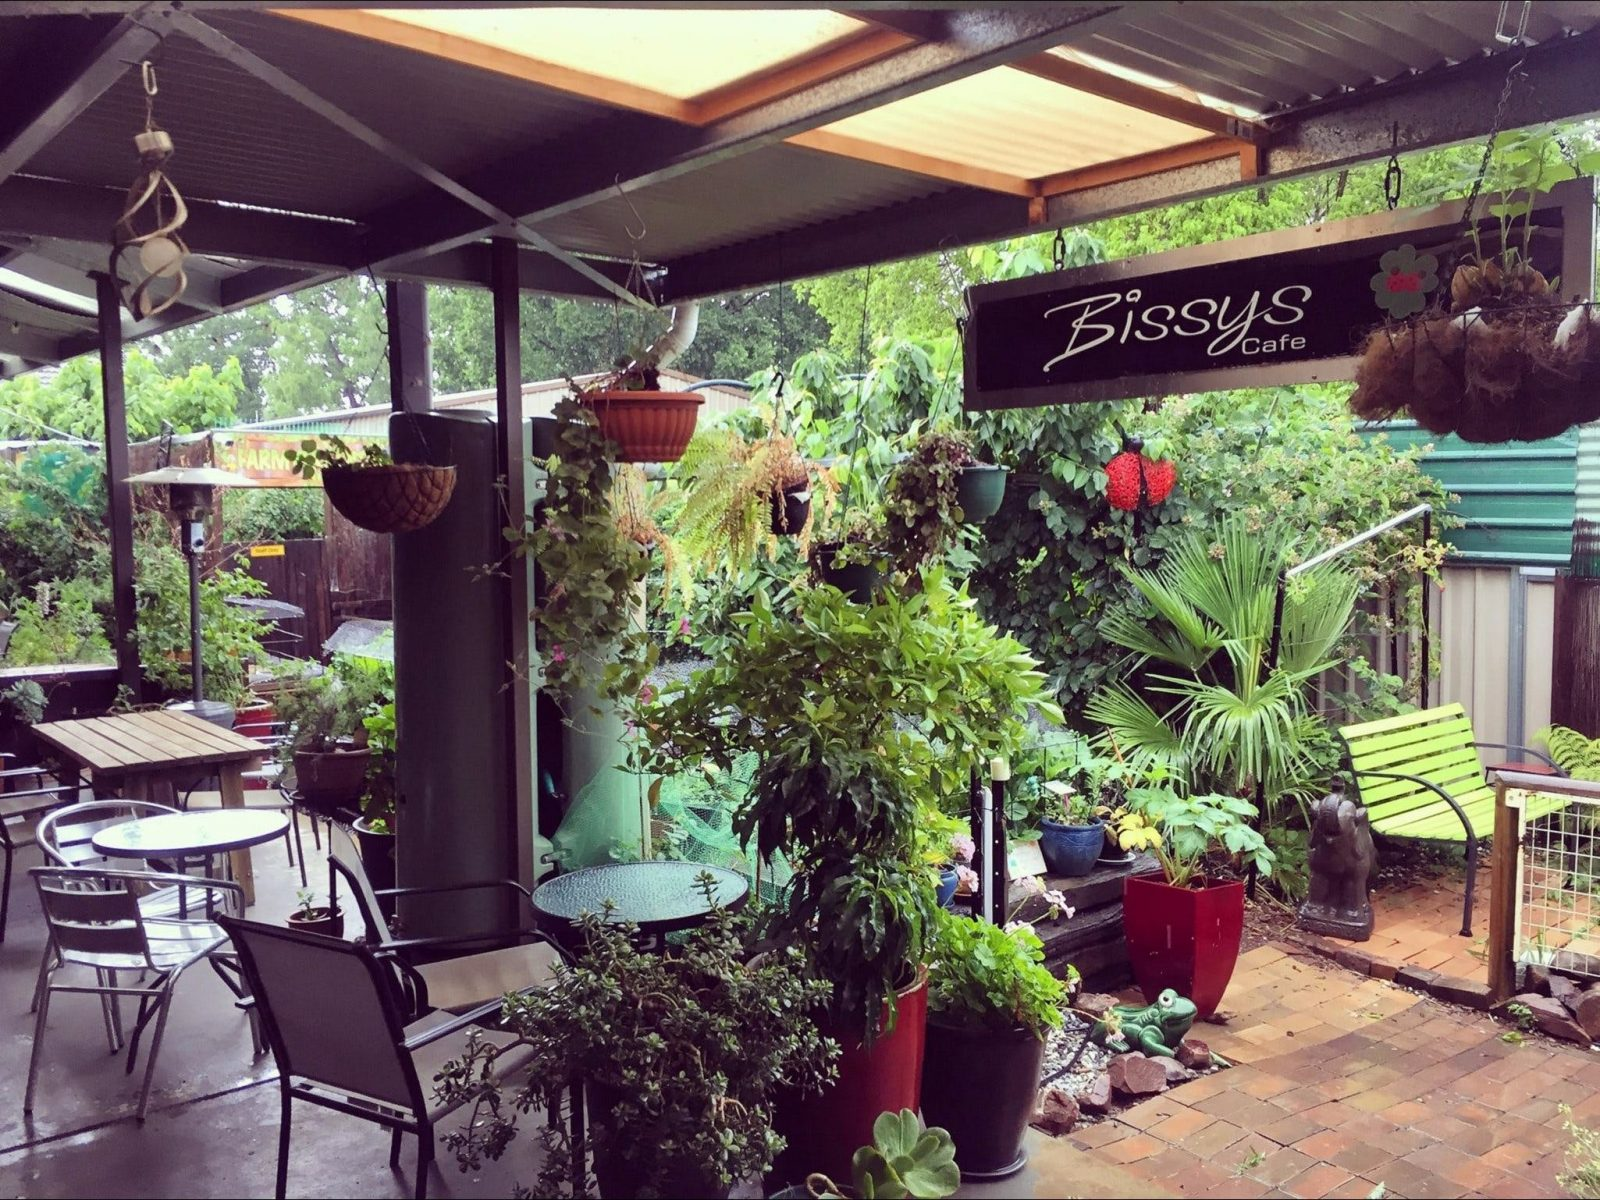 Bissys Cafe Orange